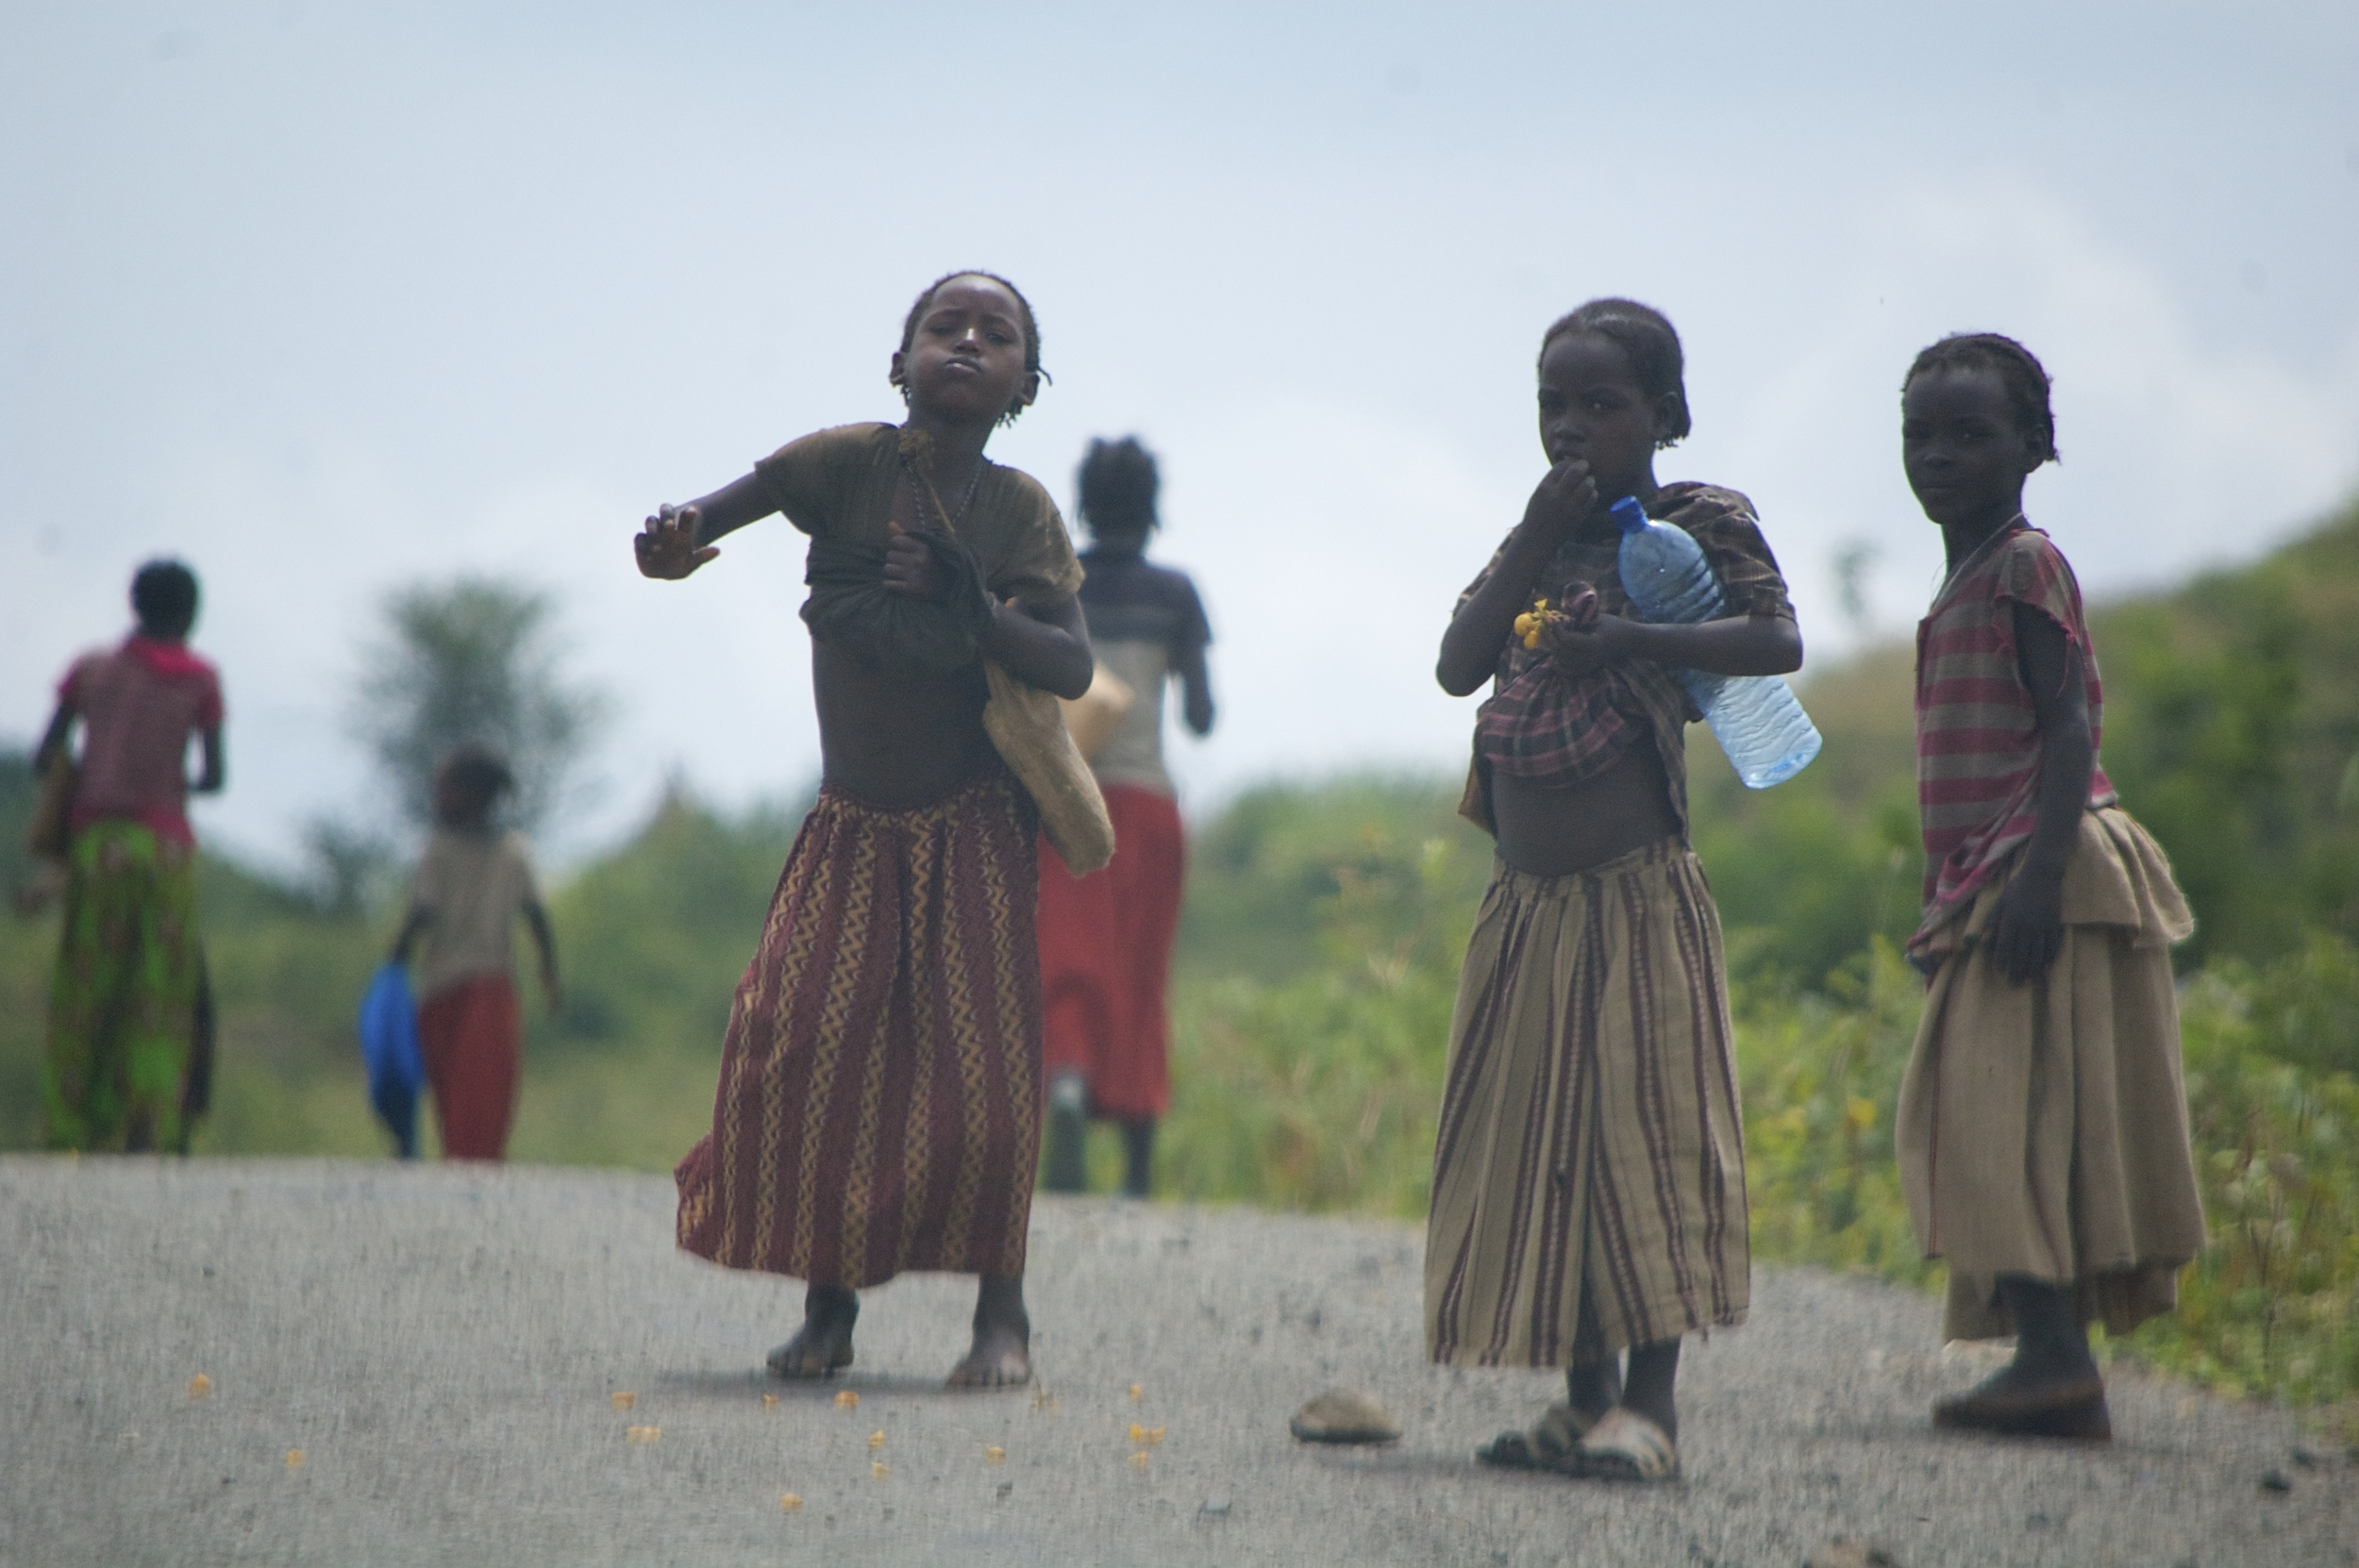 Children dancing on the roadside